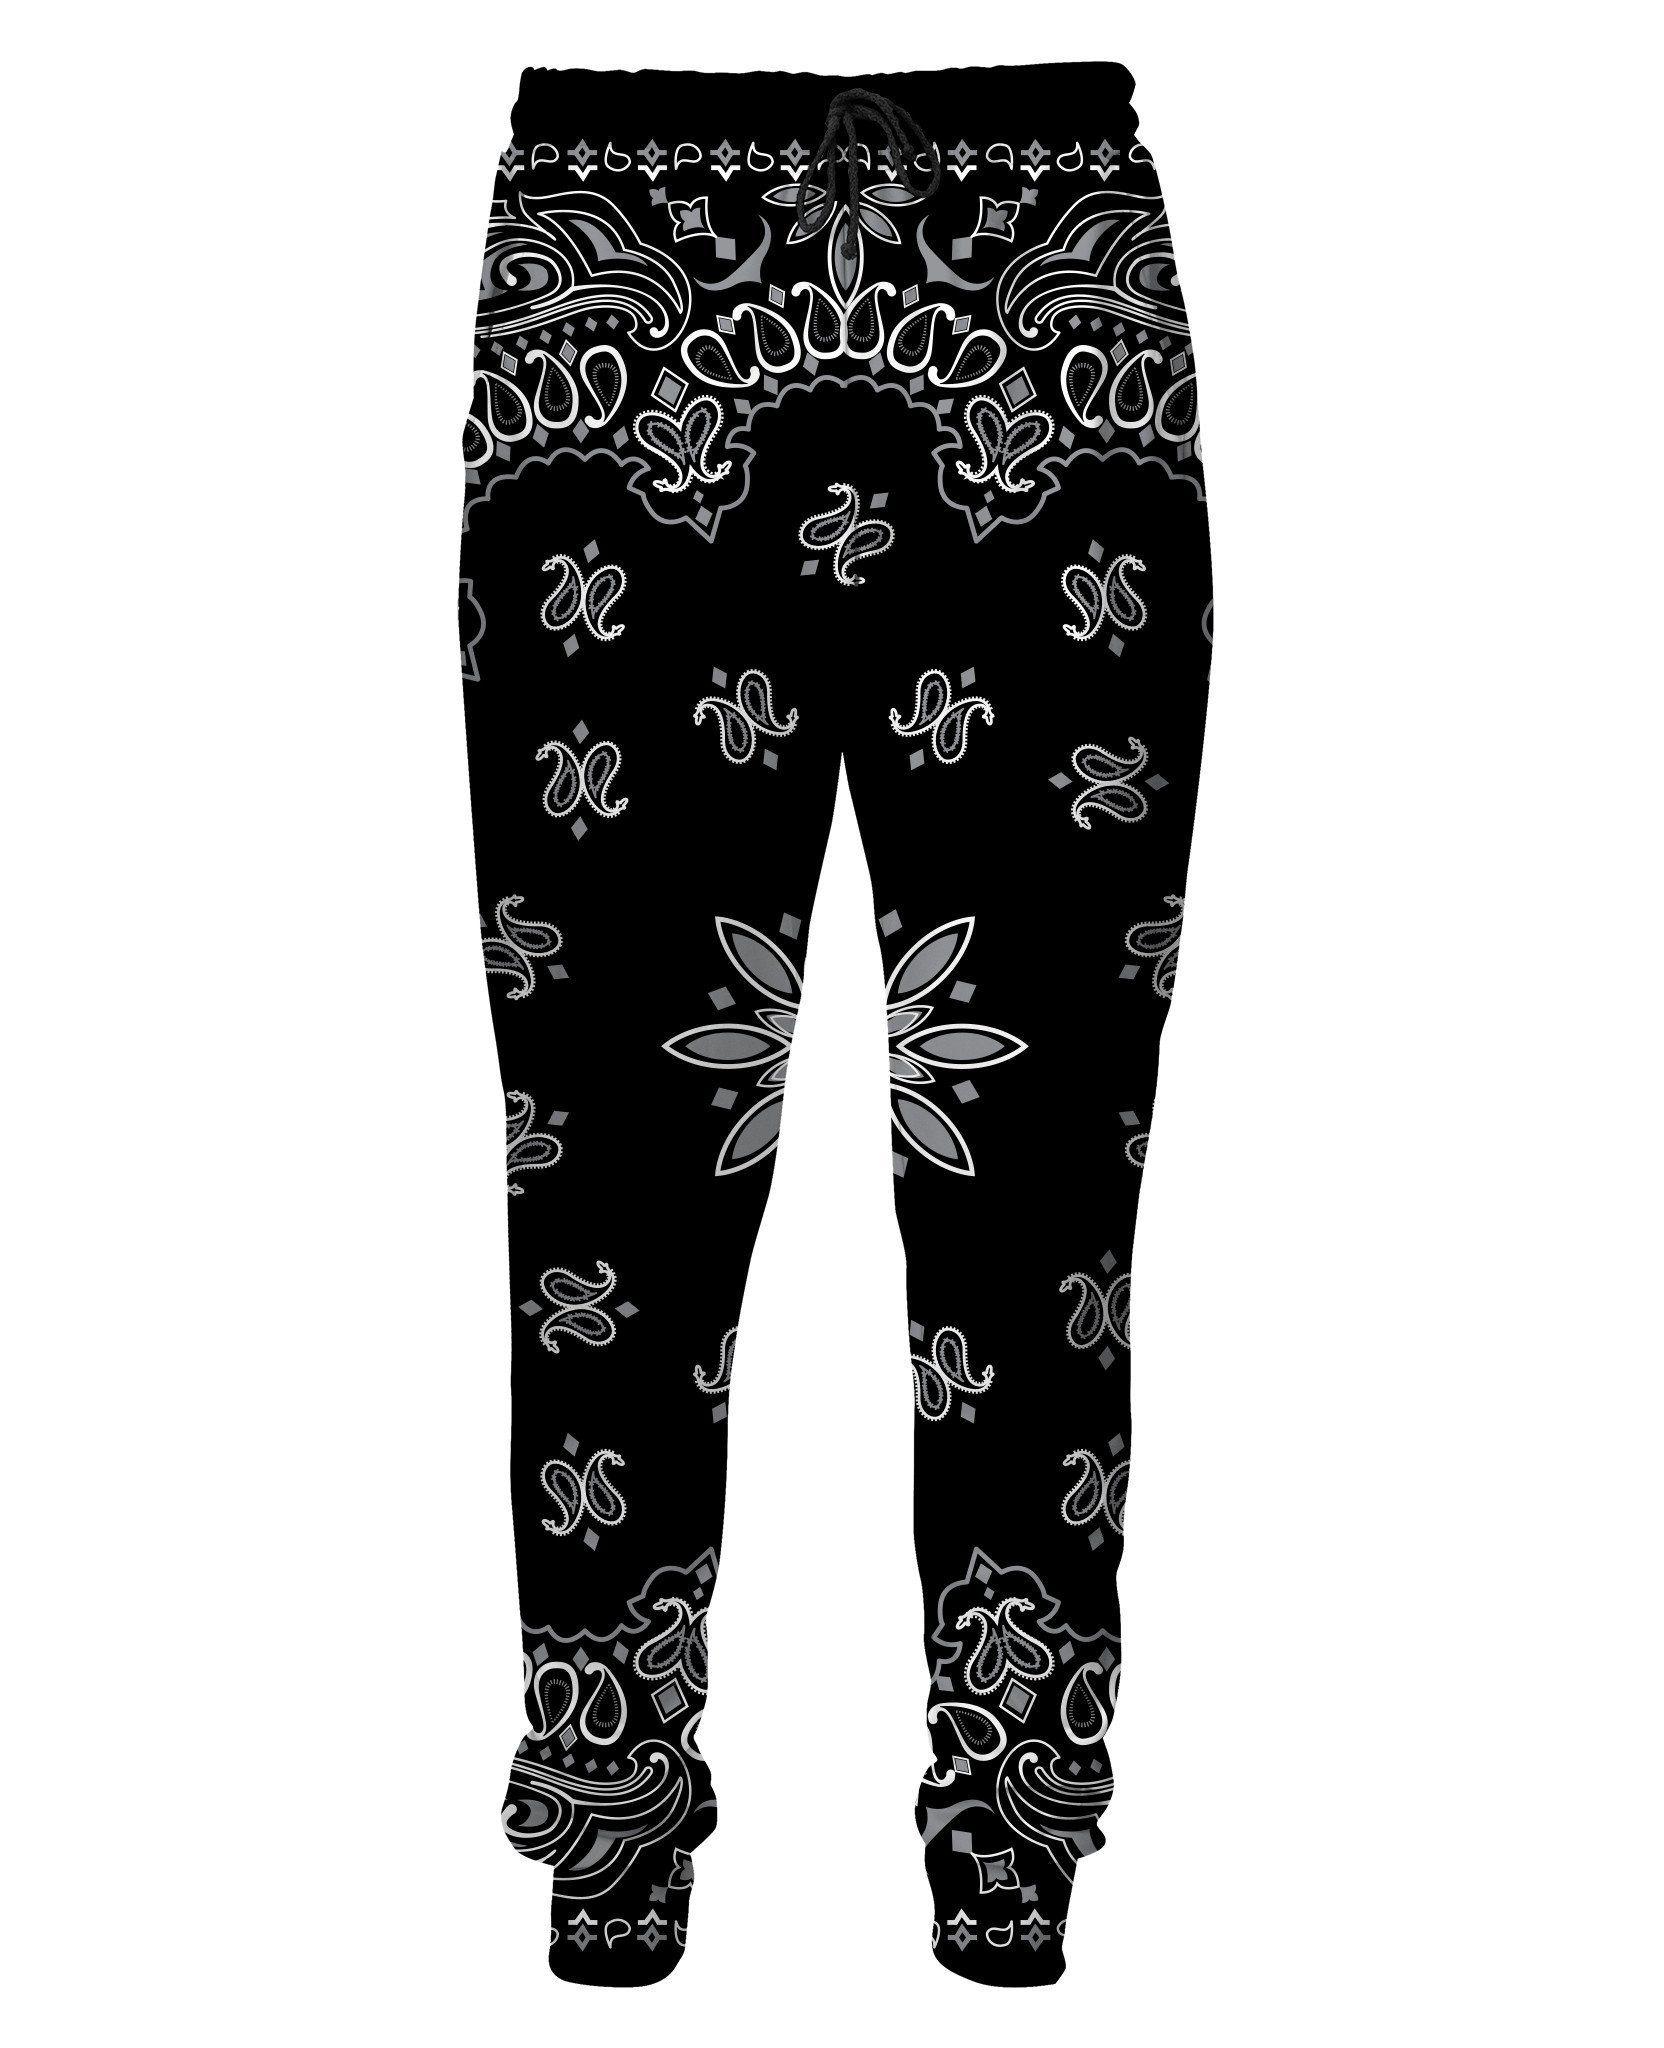 Trill Bandana Women's Joggers | Women jogger pants, Cool